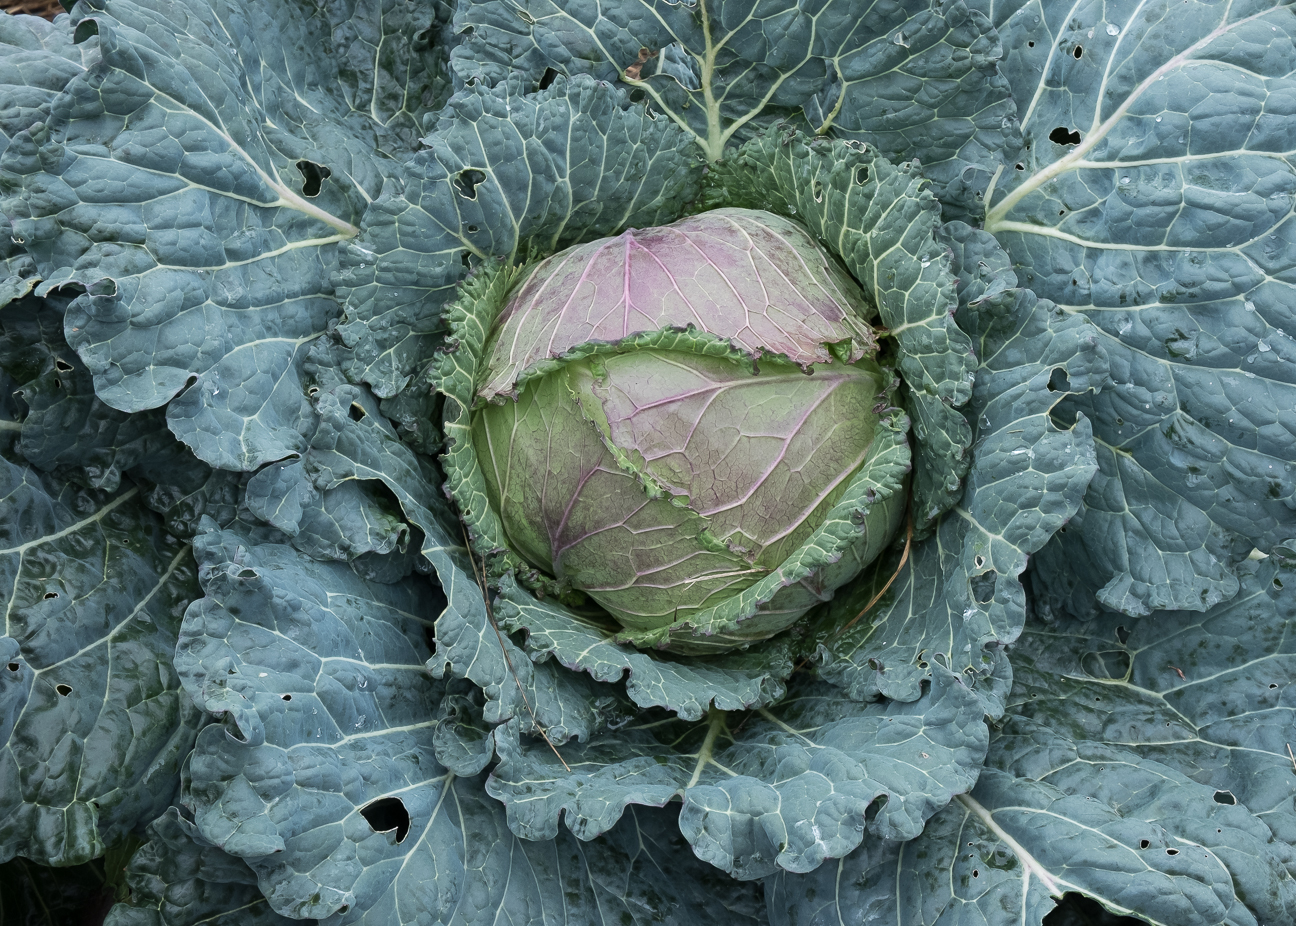 Cabbage JK 12:18